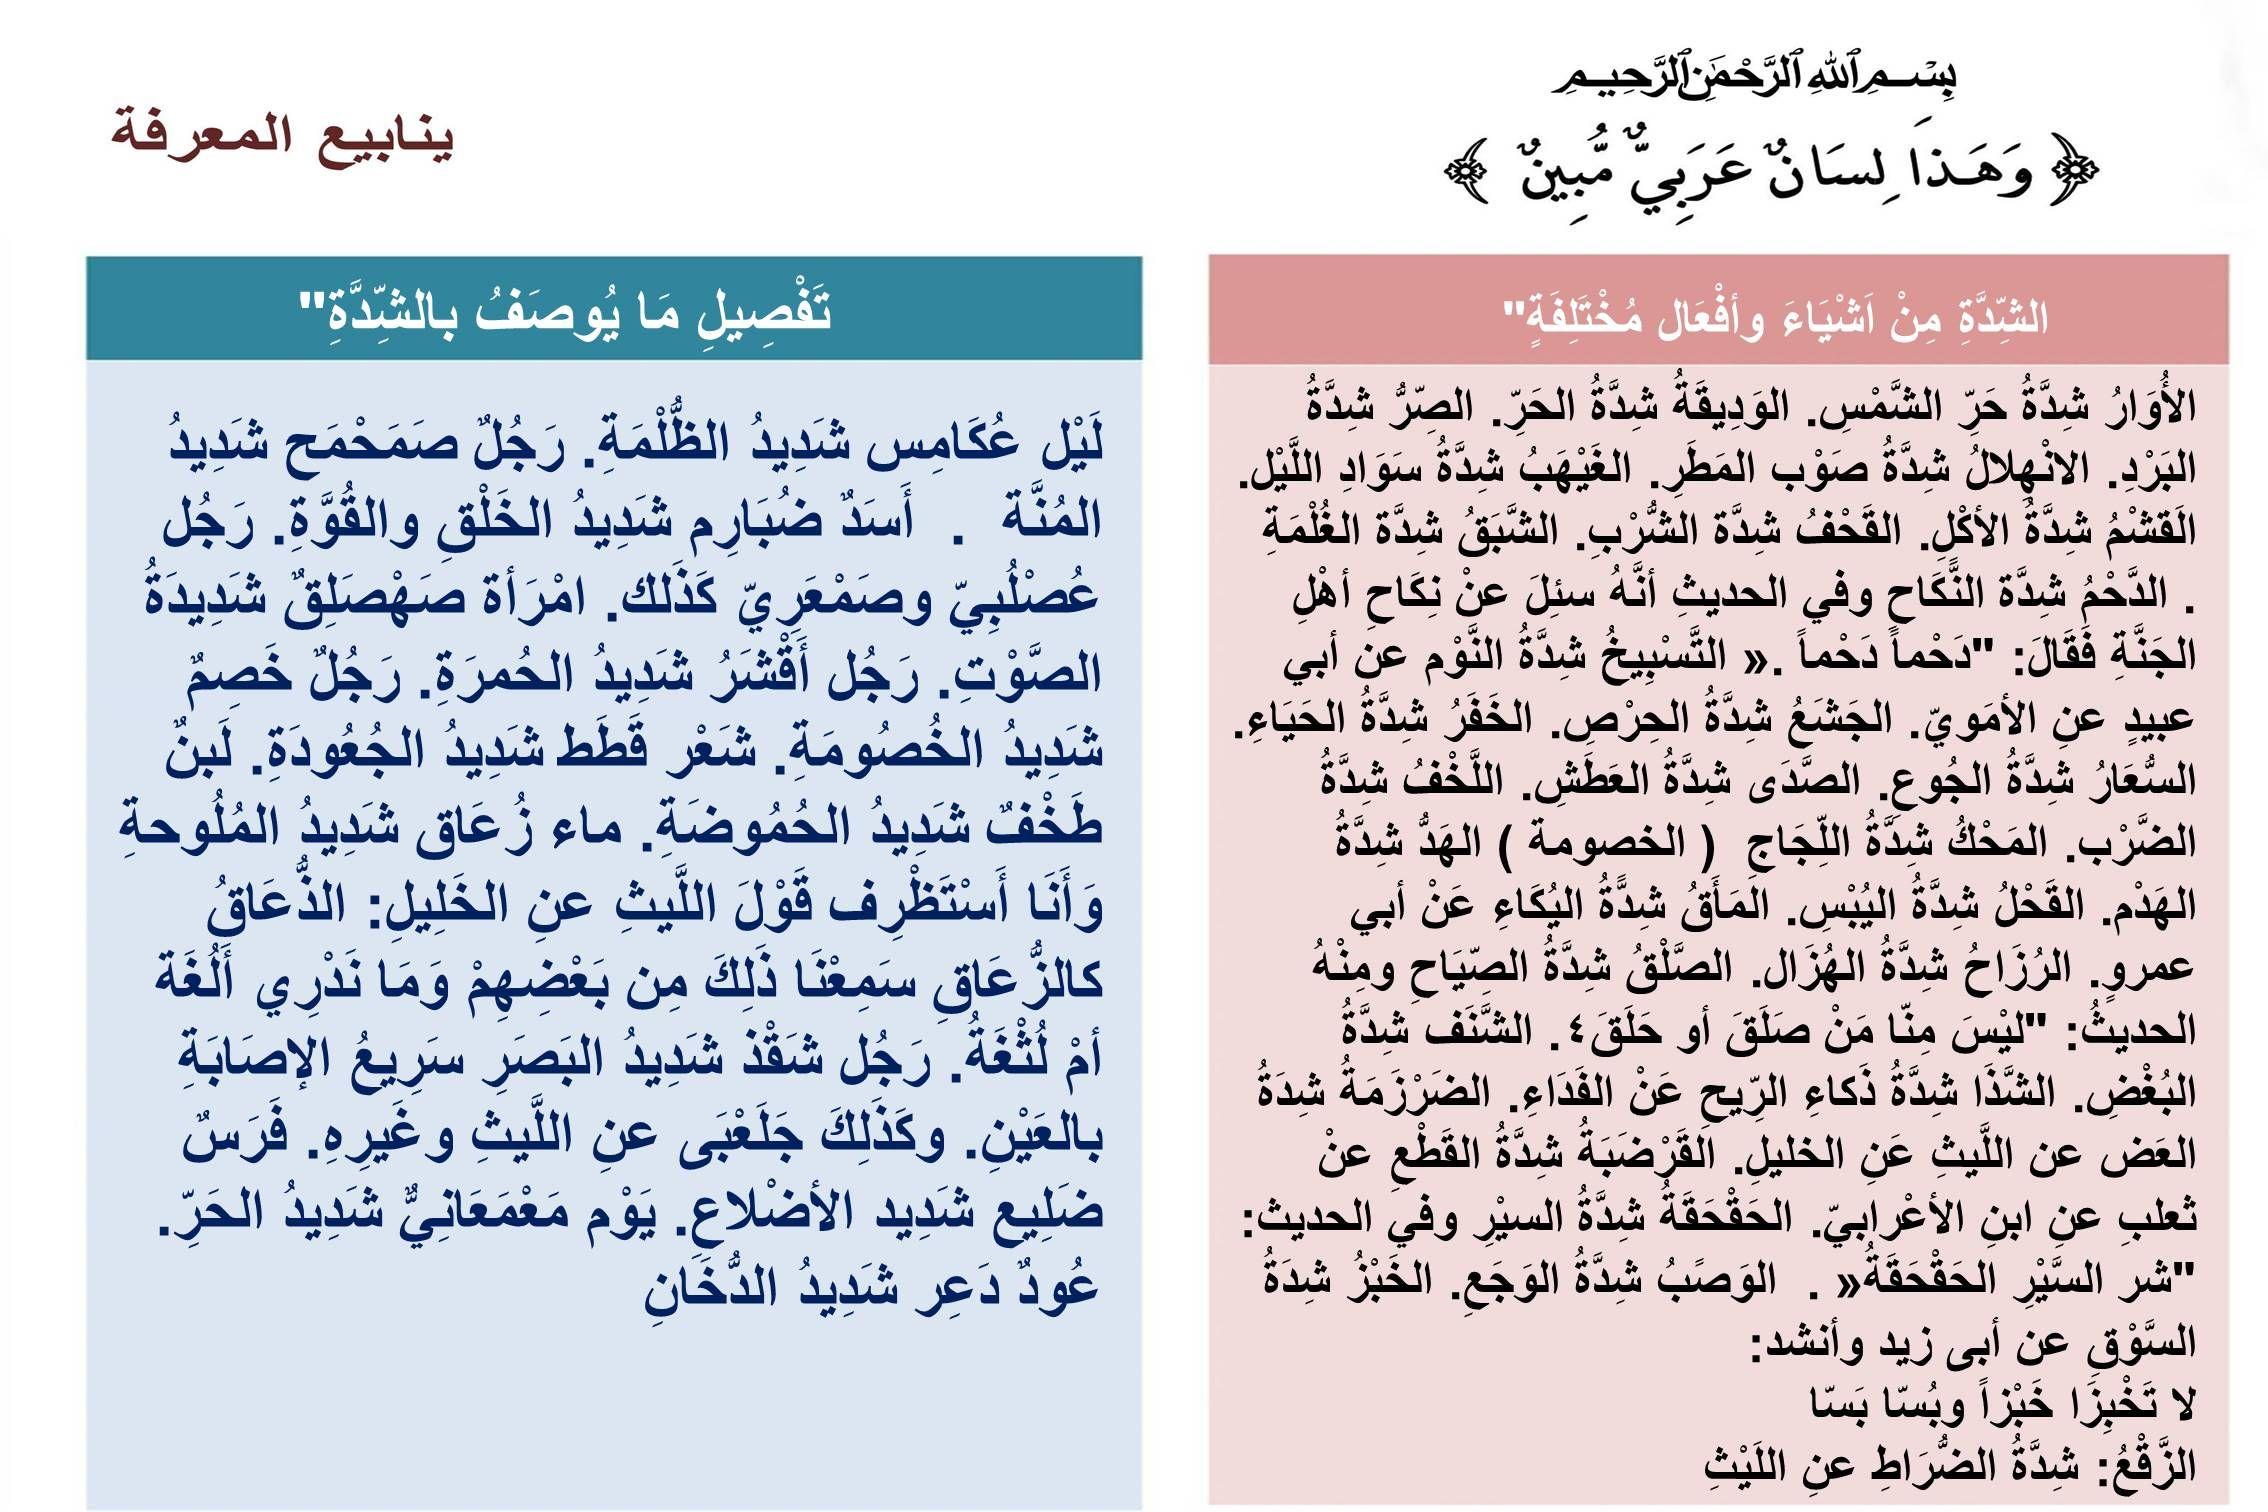 Pin By Almamlooh On لغتنا الجميلة